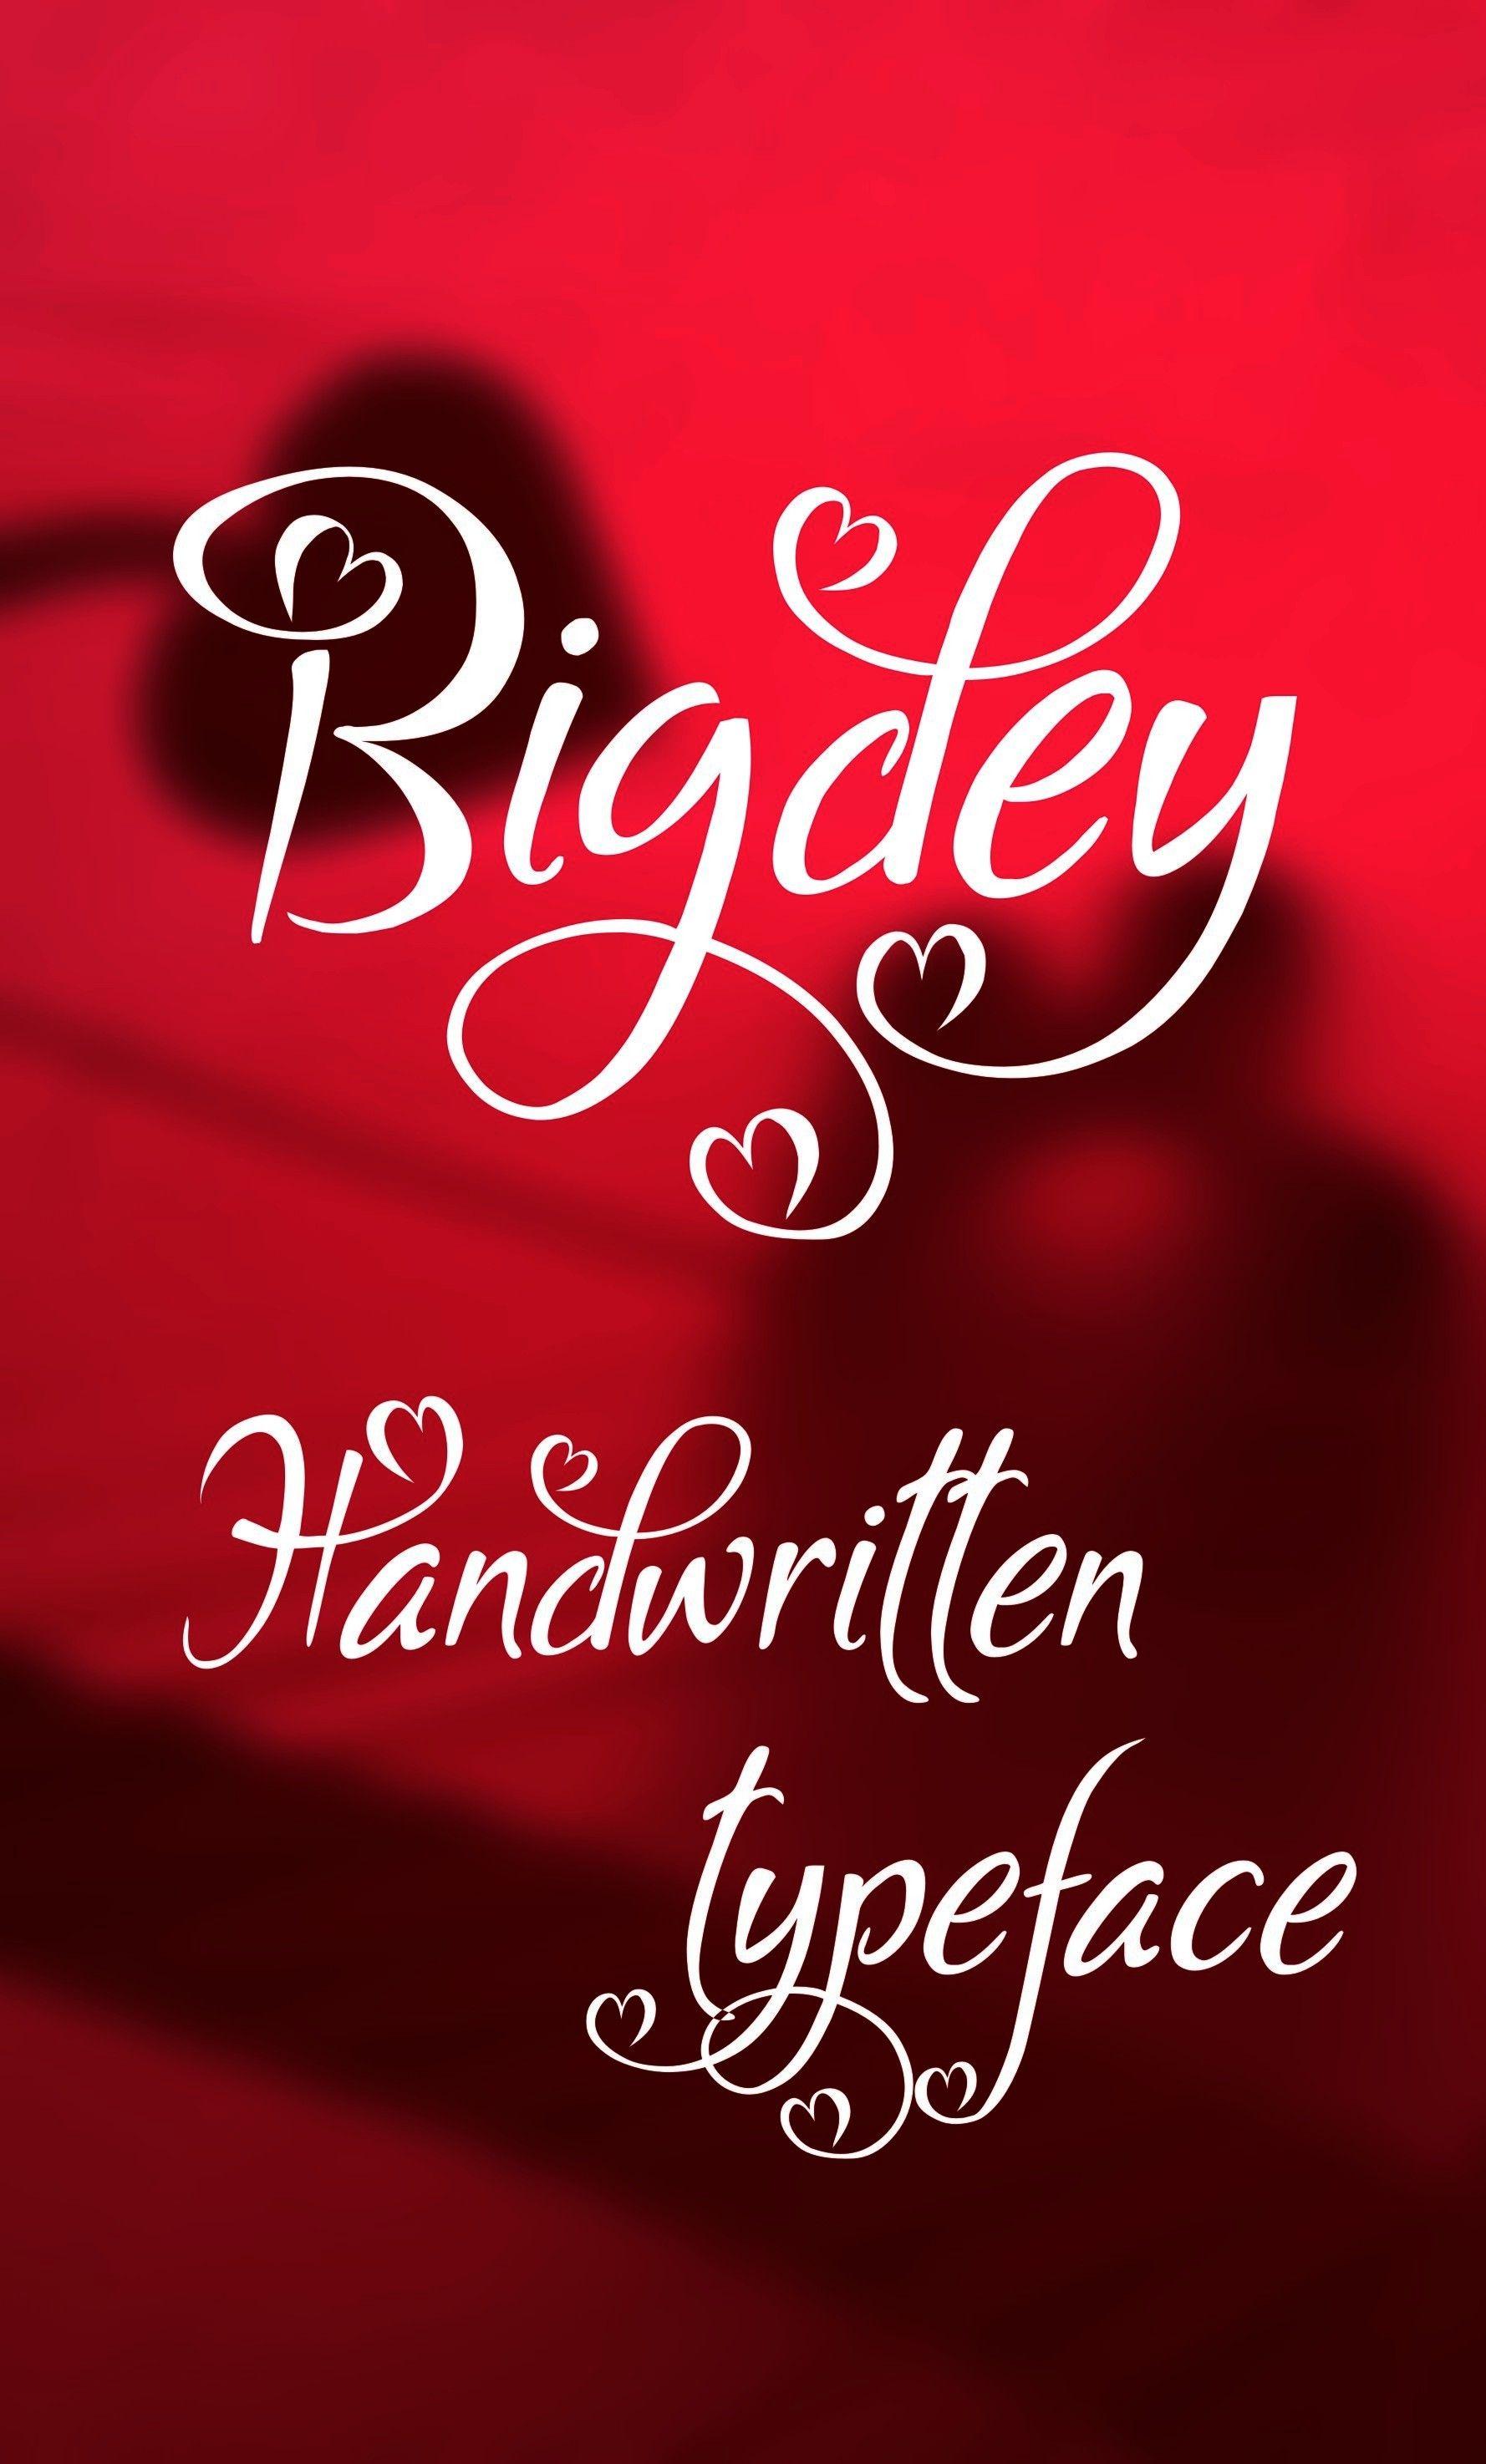 Digital font, Bigdey font, handwritten font, hand lettered